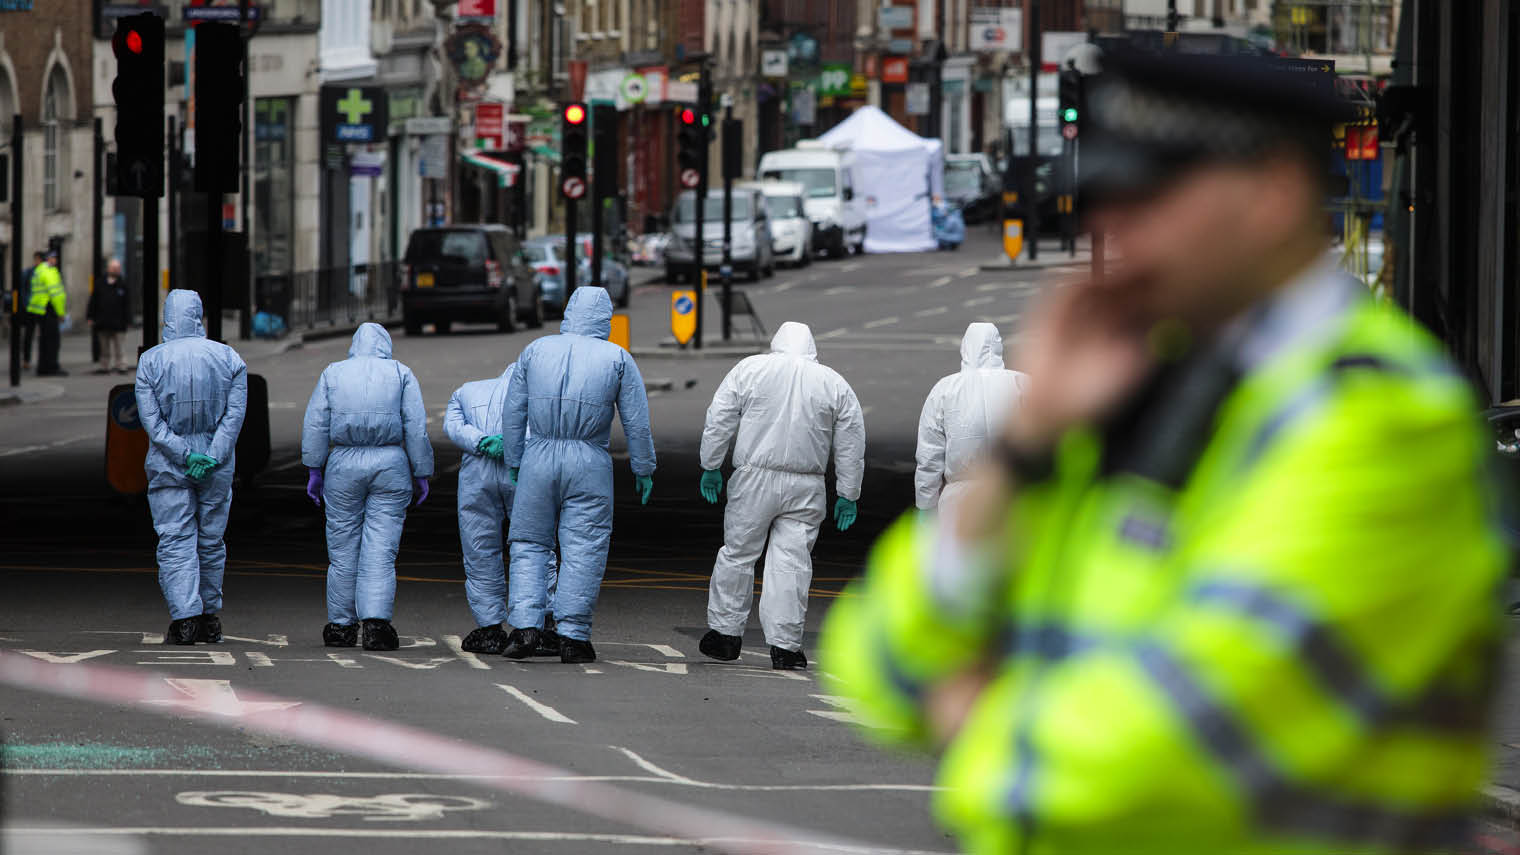 Forensic investigators at the London Bridge attack aftermath